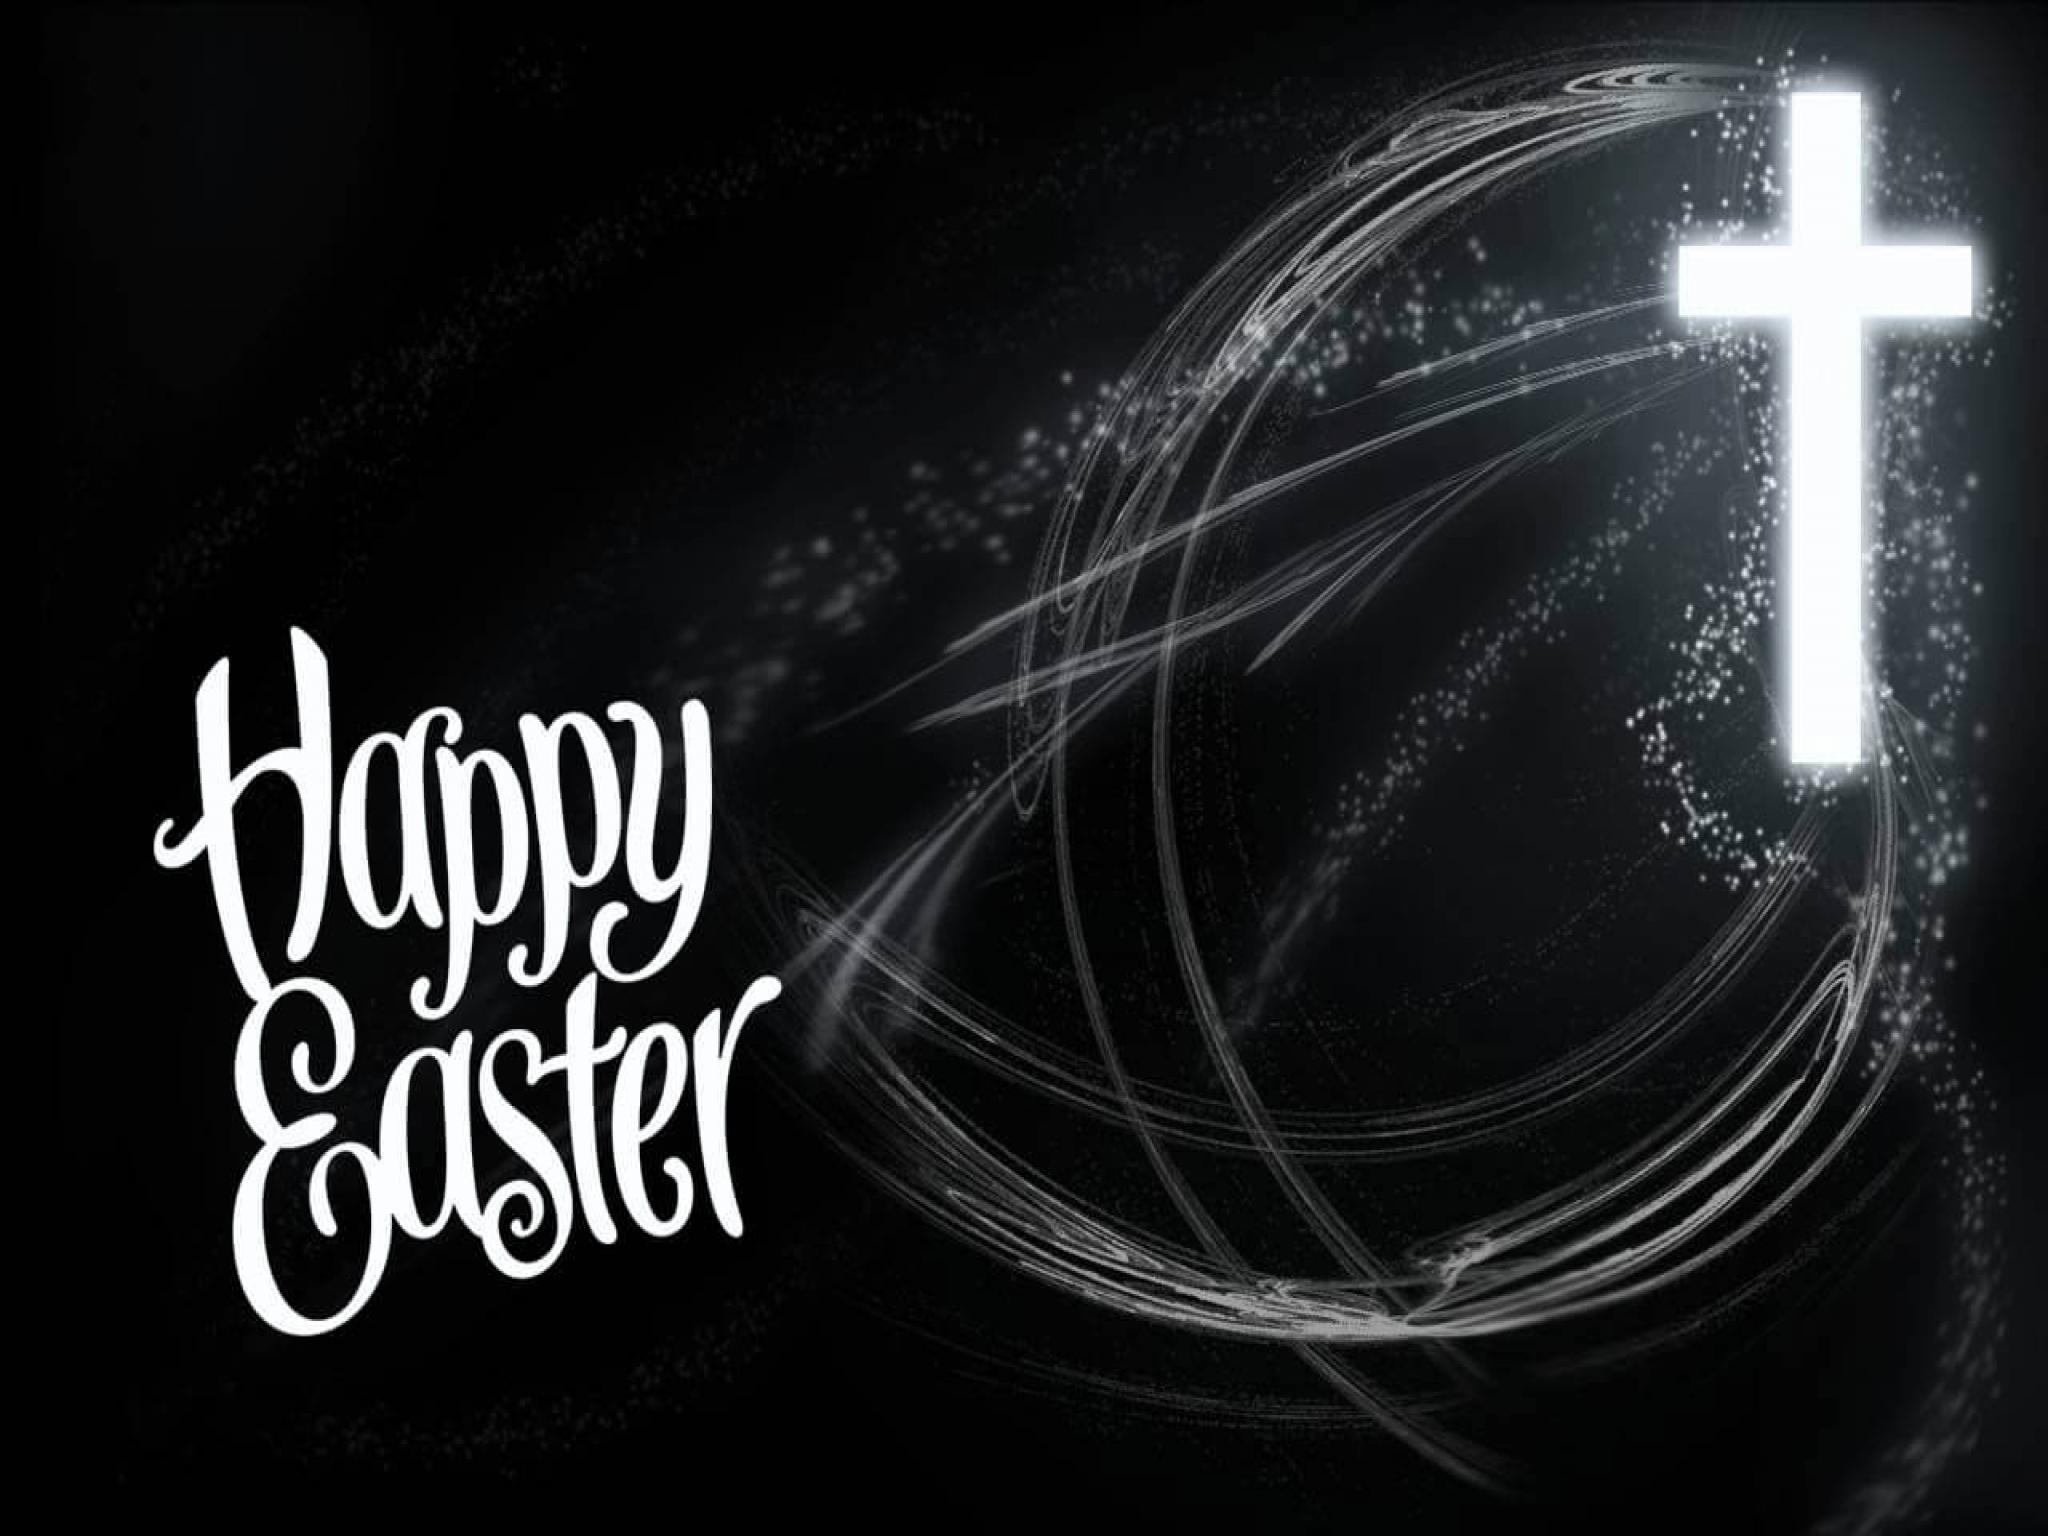 Easter Resurrection Love Jesus Rose Again Hd Wallpaper